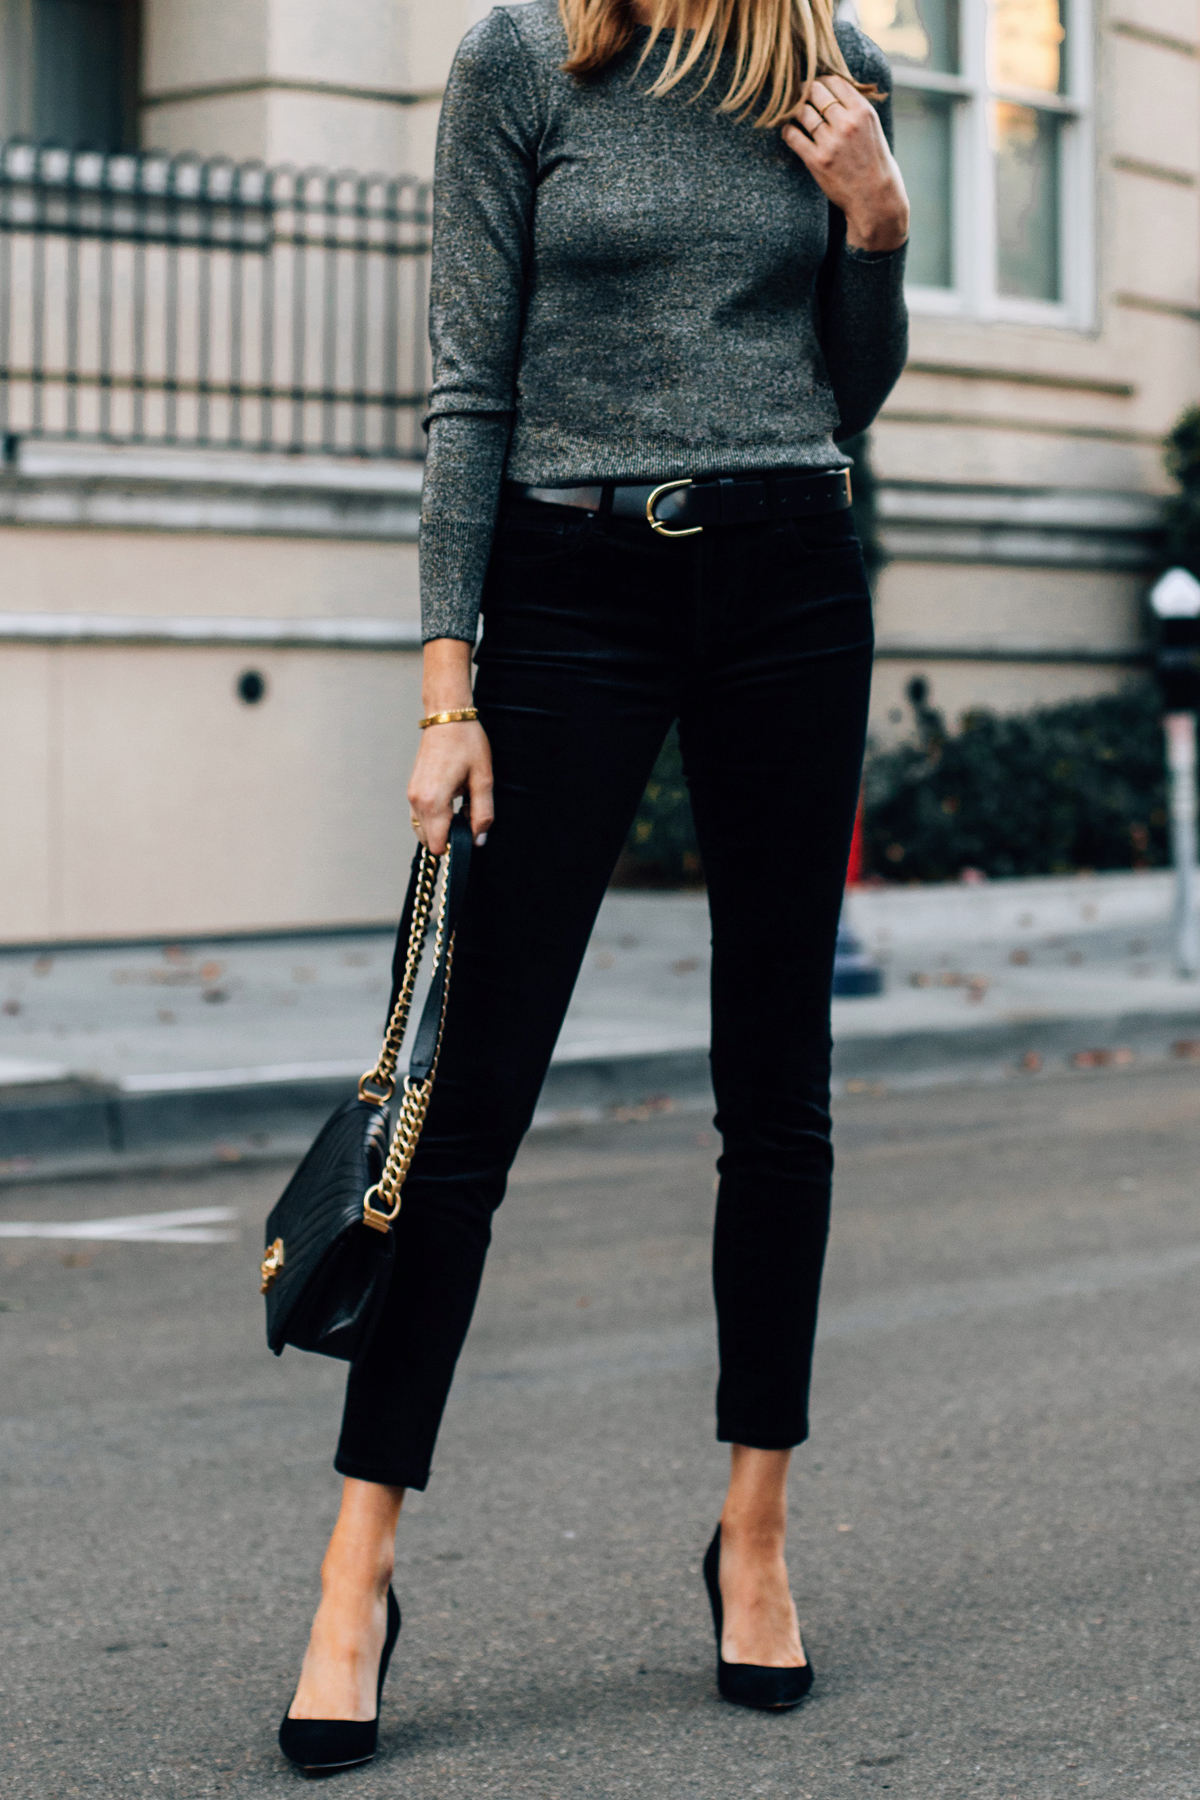 Woman Wearing Metallic Sweater Black Velvet Jeans Black Suede Pumps Fashion Jackson San Diego Fashion Blogger Street Style